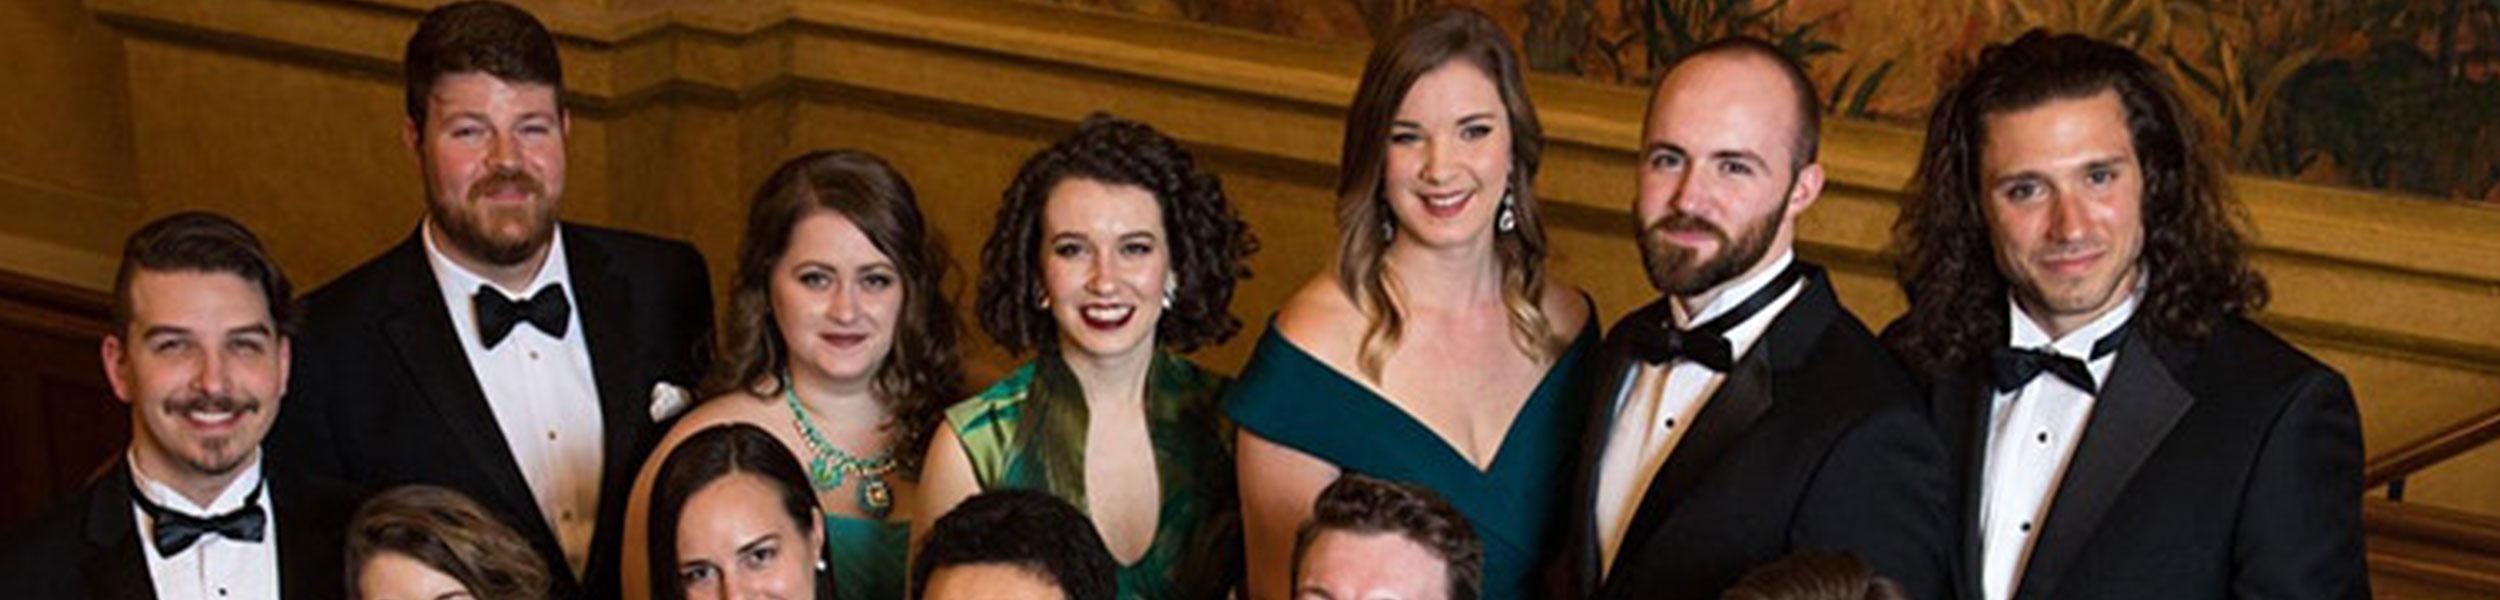 Eureka Chamber Music Series: Adler Fellows of San Francisco Opera